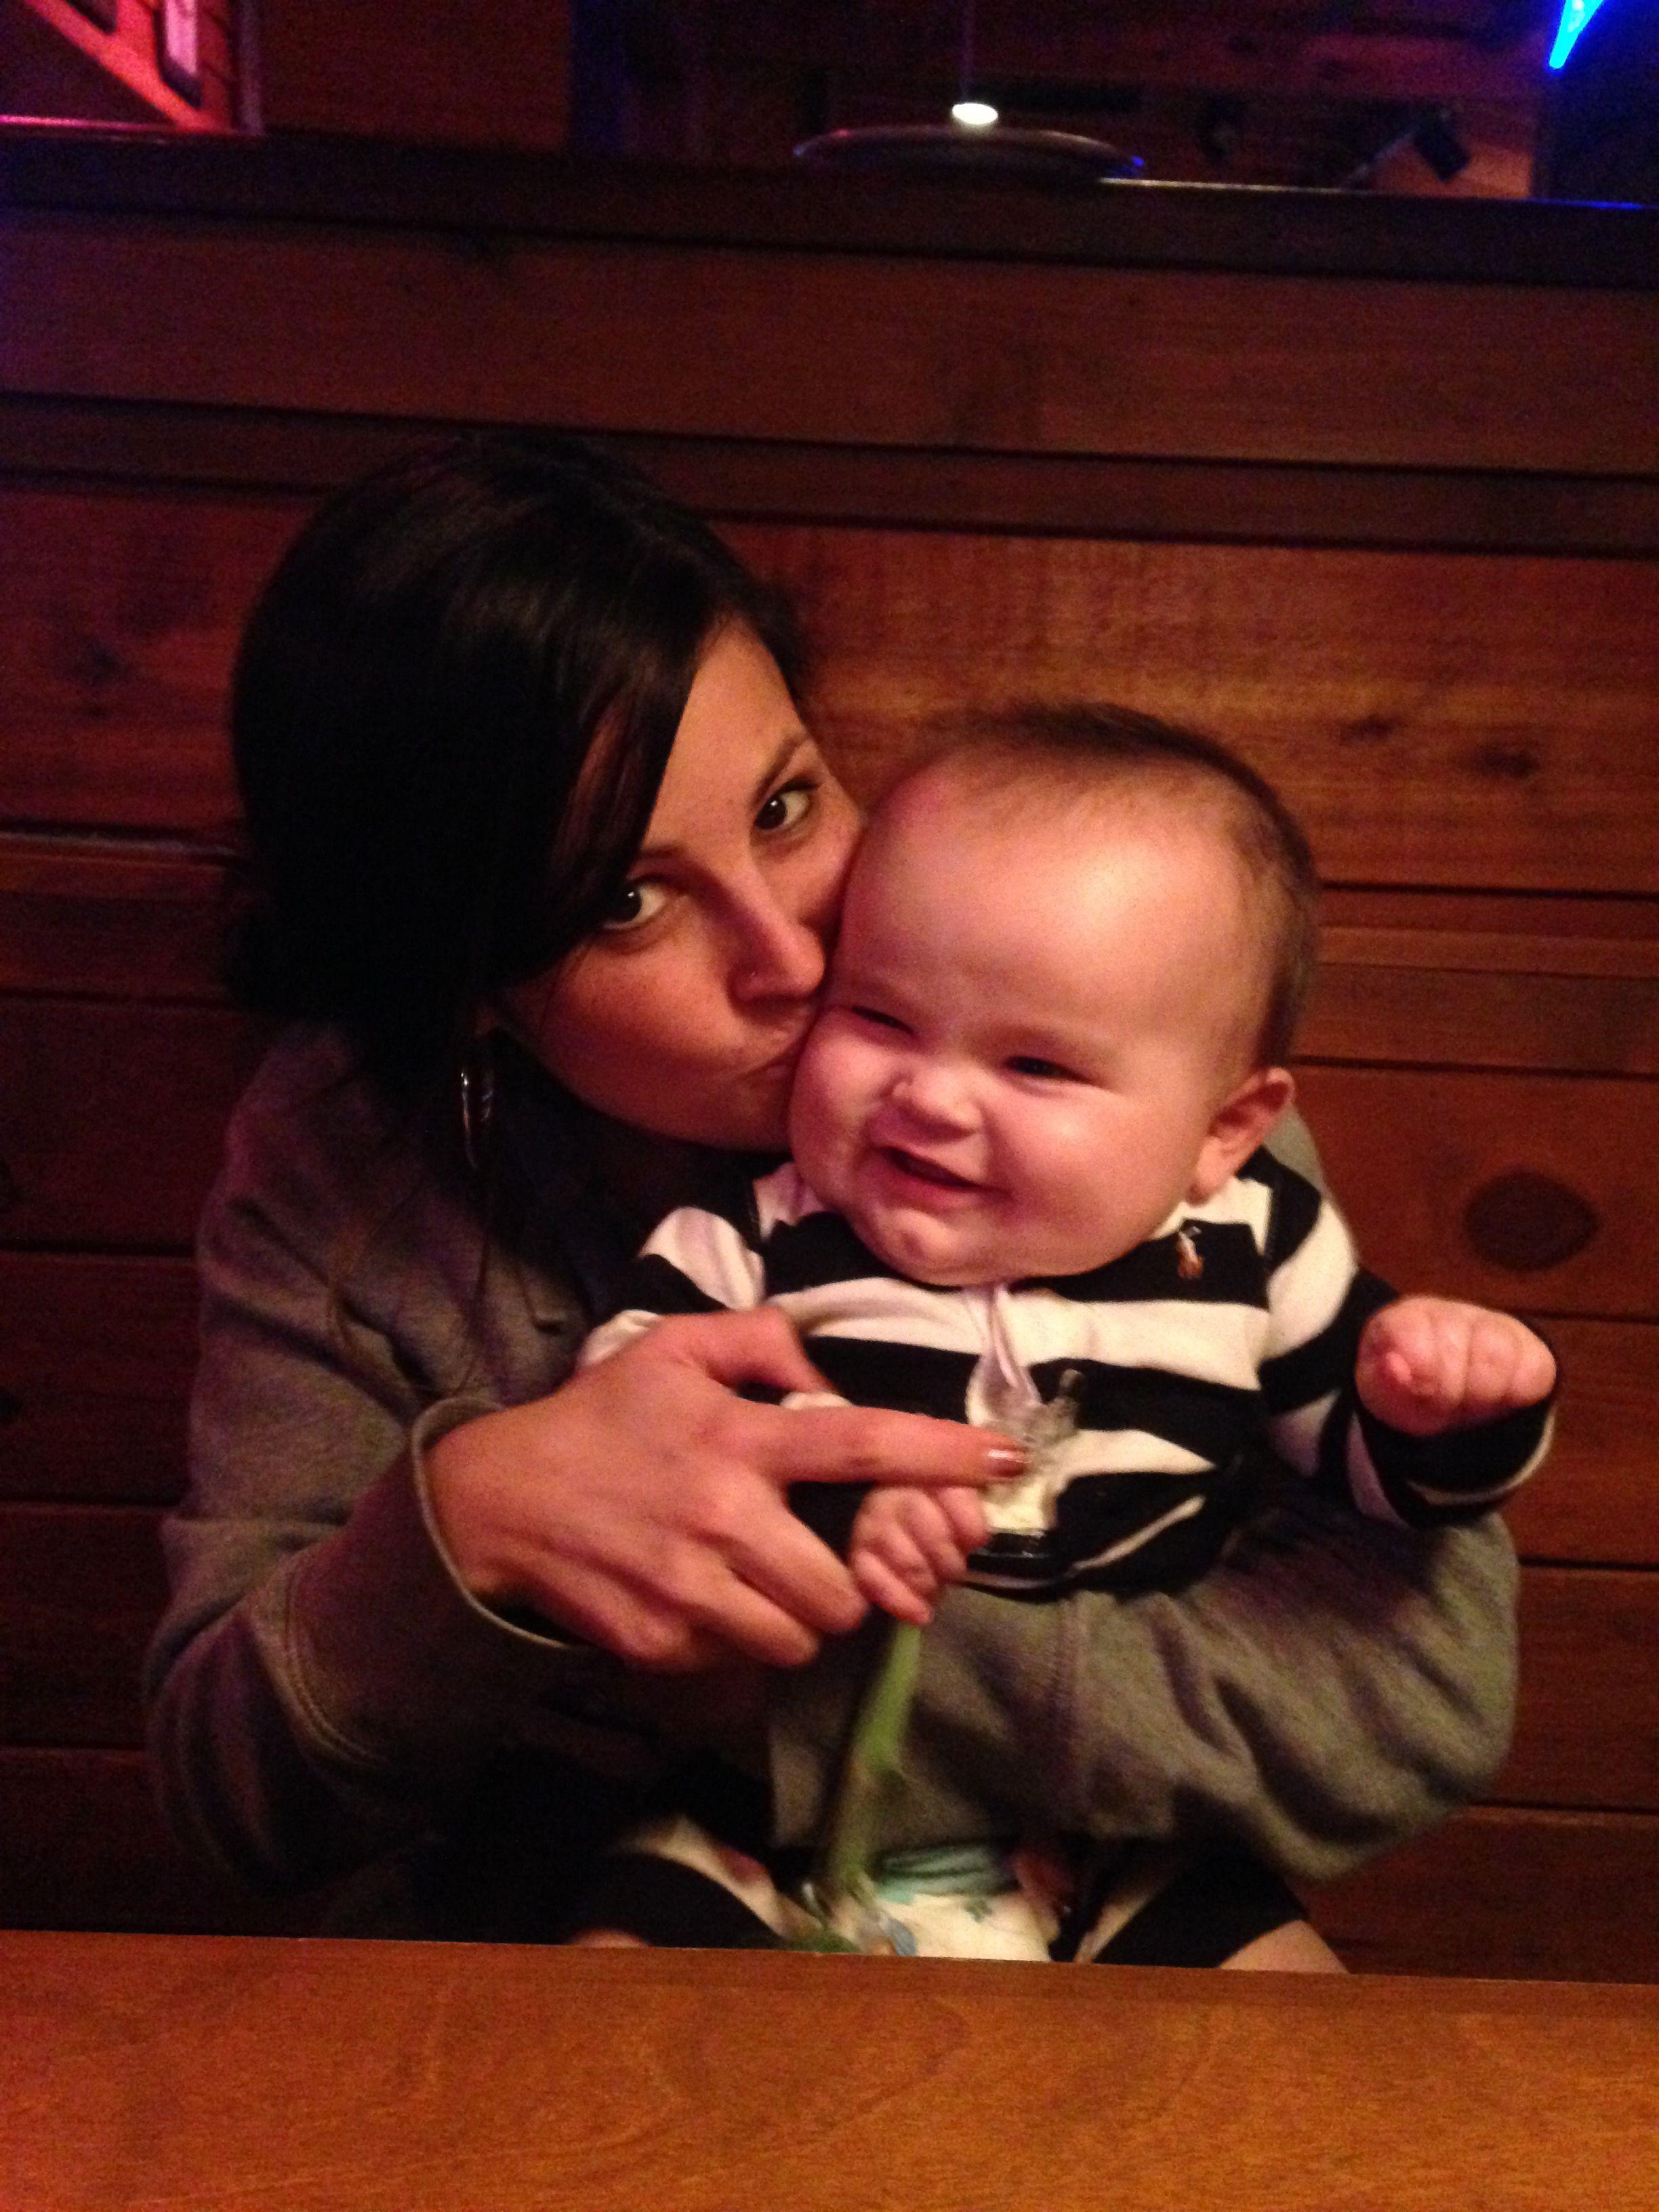 He loves kisses from mommy